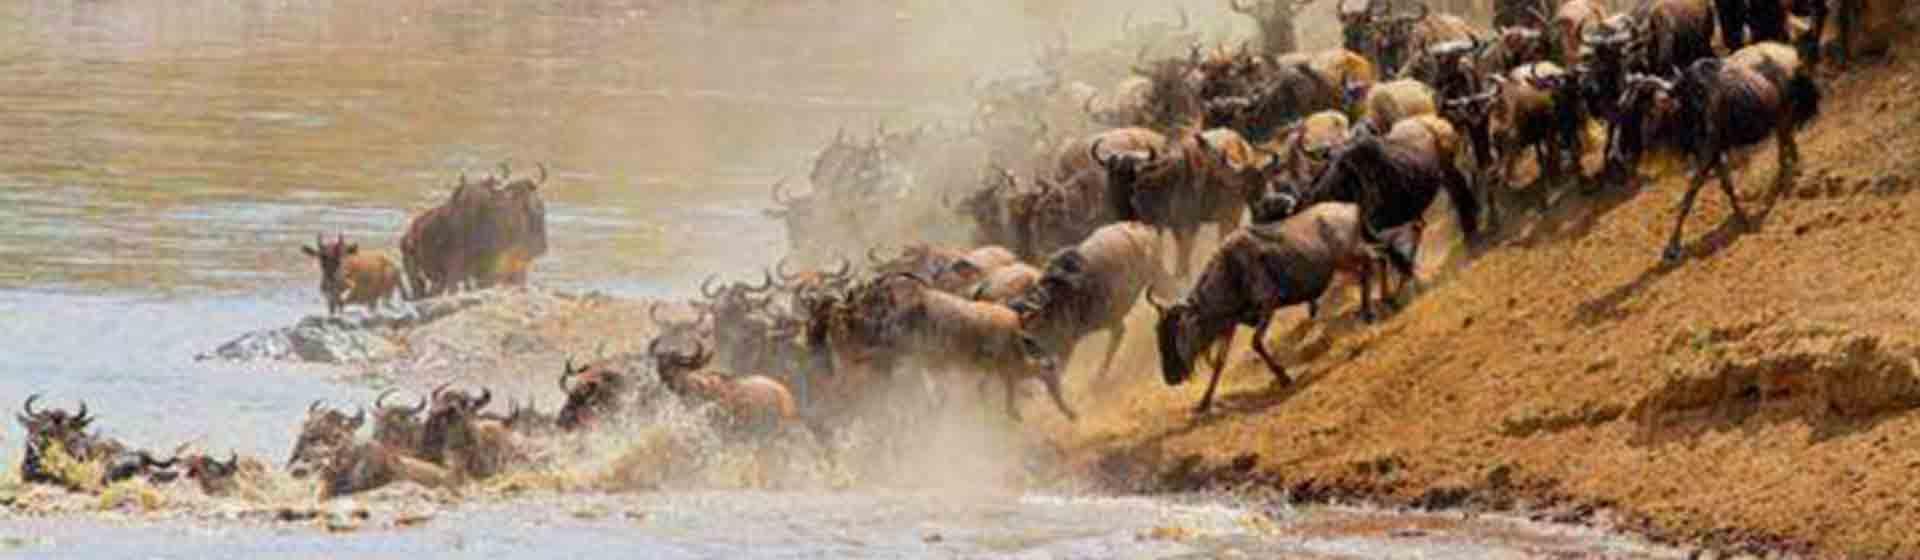 Tanzania Serengeti Wildebeest migration safari, Wildebeest calving safari